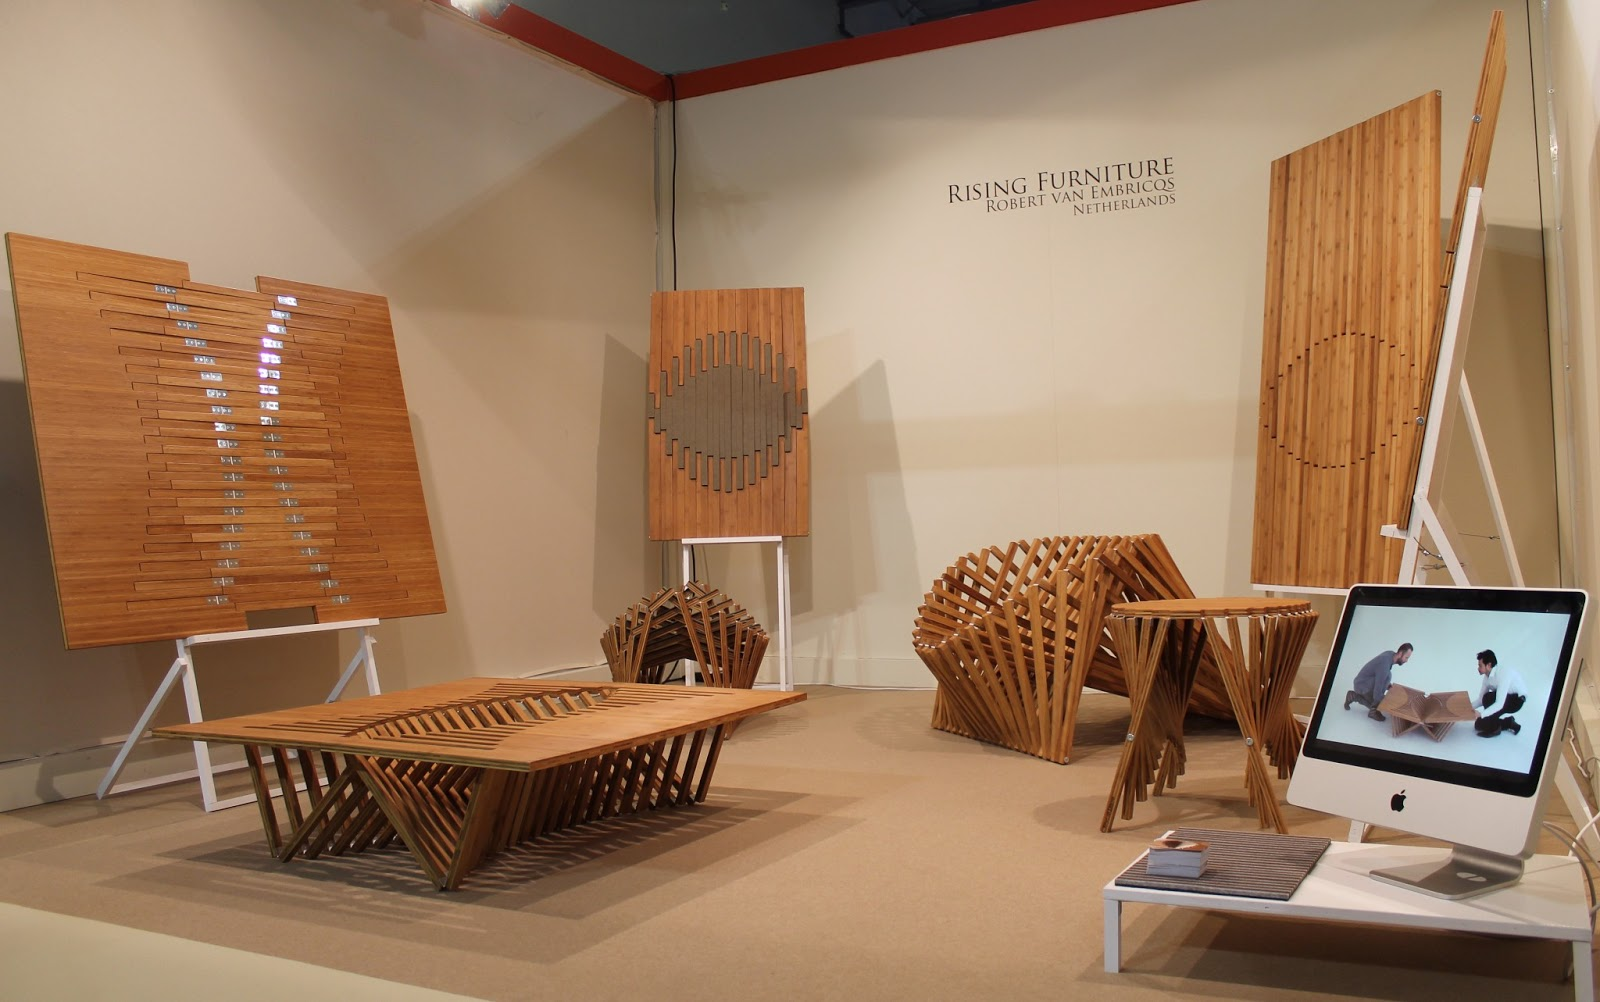 rosing furniture_1